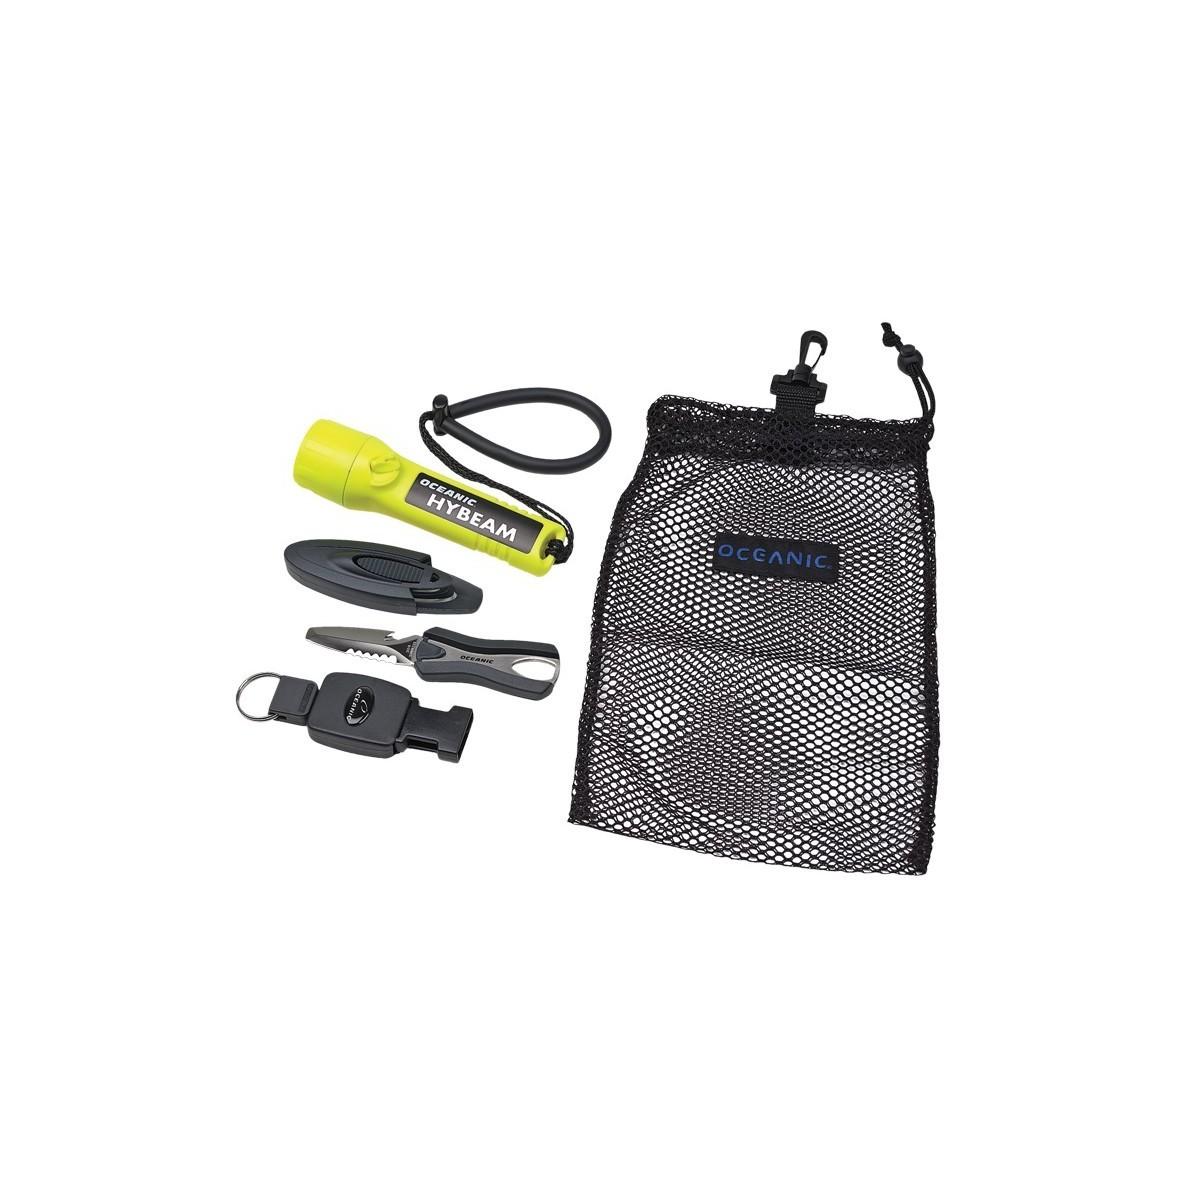 Oceanic bc accessory kit